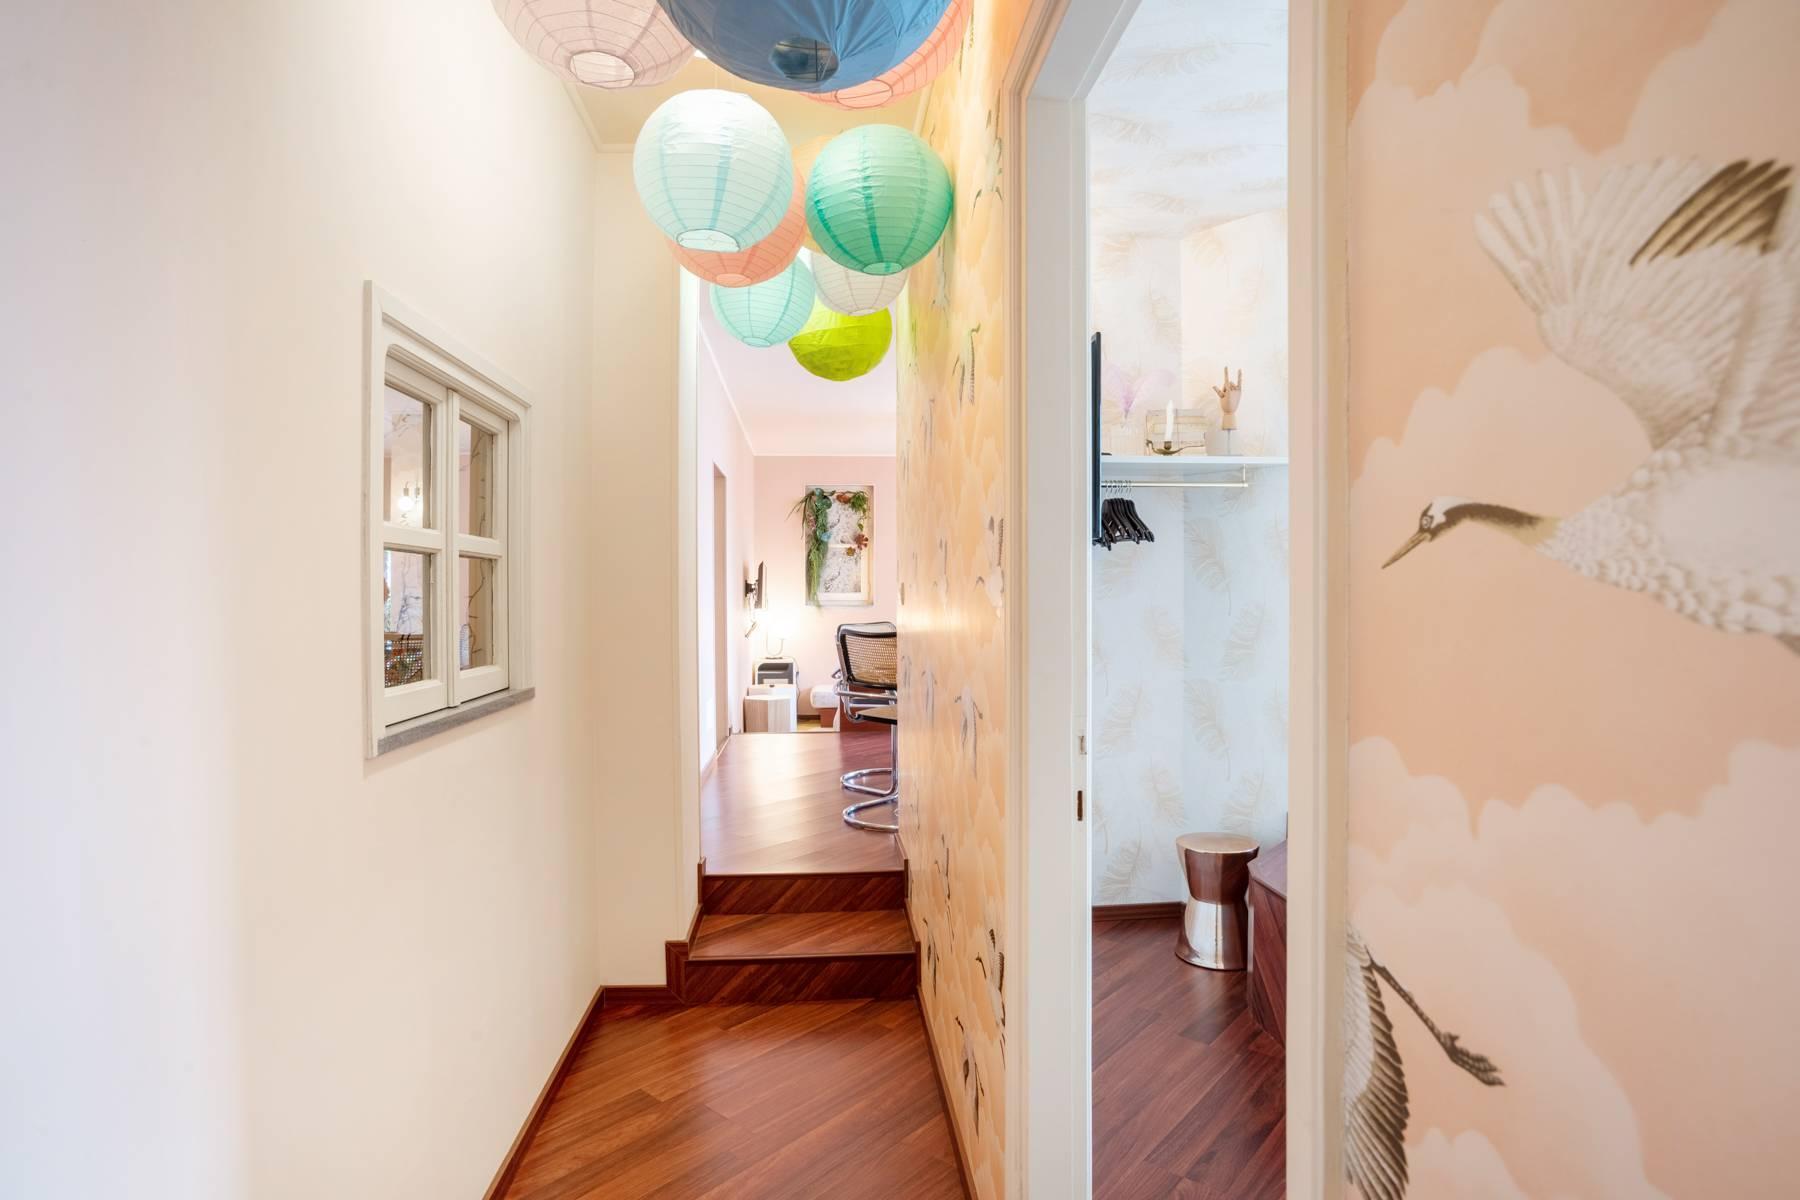 Elegant apartment in the small hamlet of Belgirate - 10